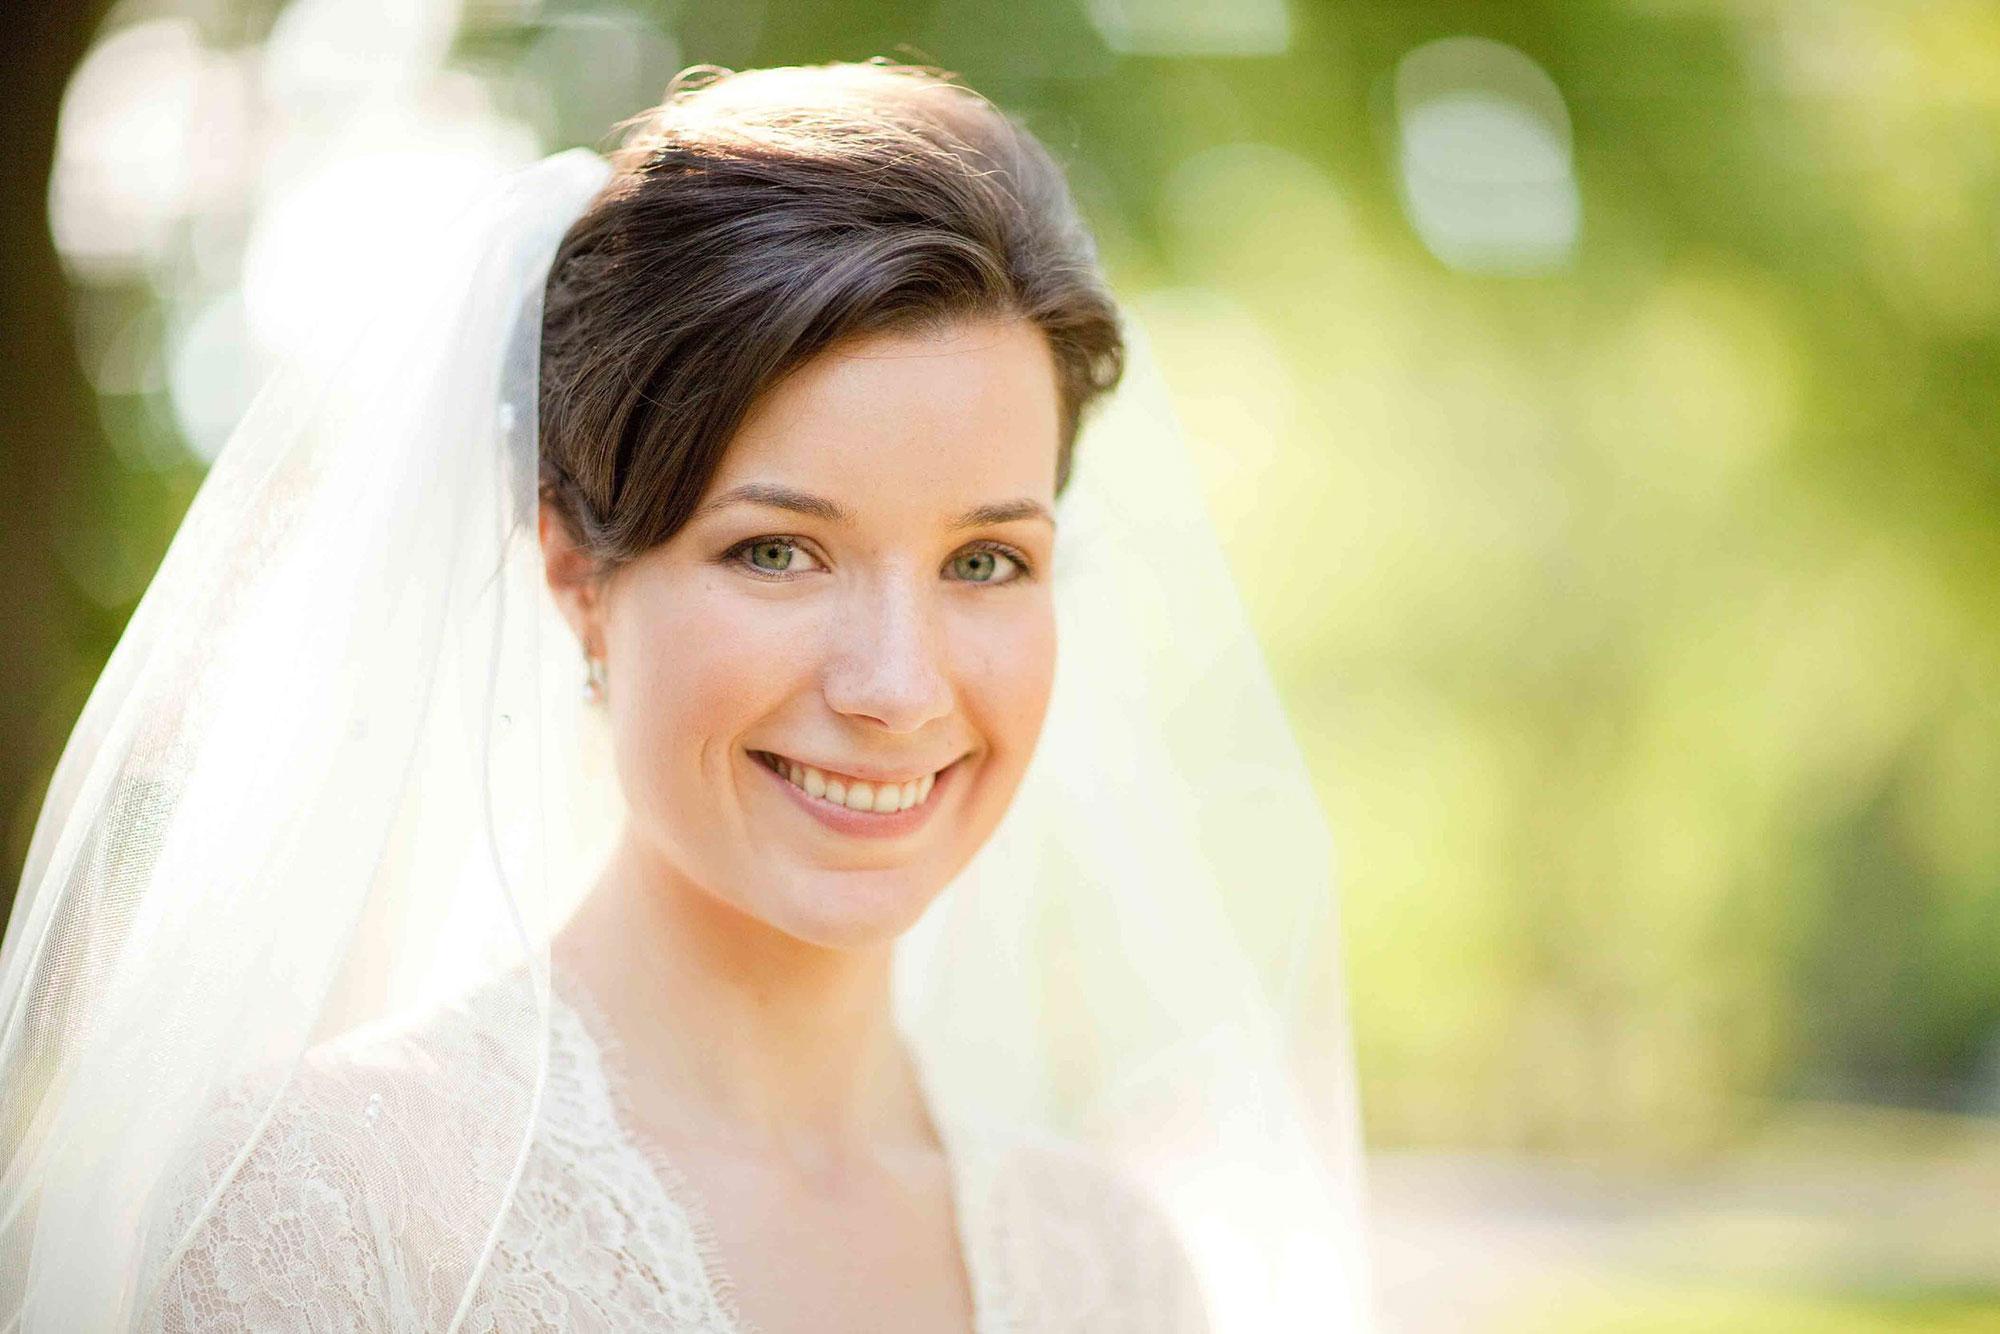 Amanda-Cowley-Willowbank-Vineyard-Bride-Photo-By-White-Photographie-024.jpg